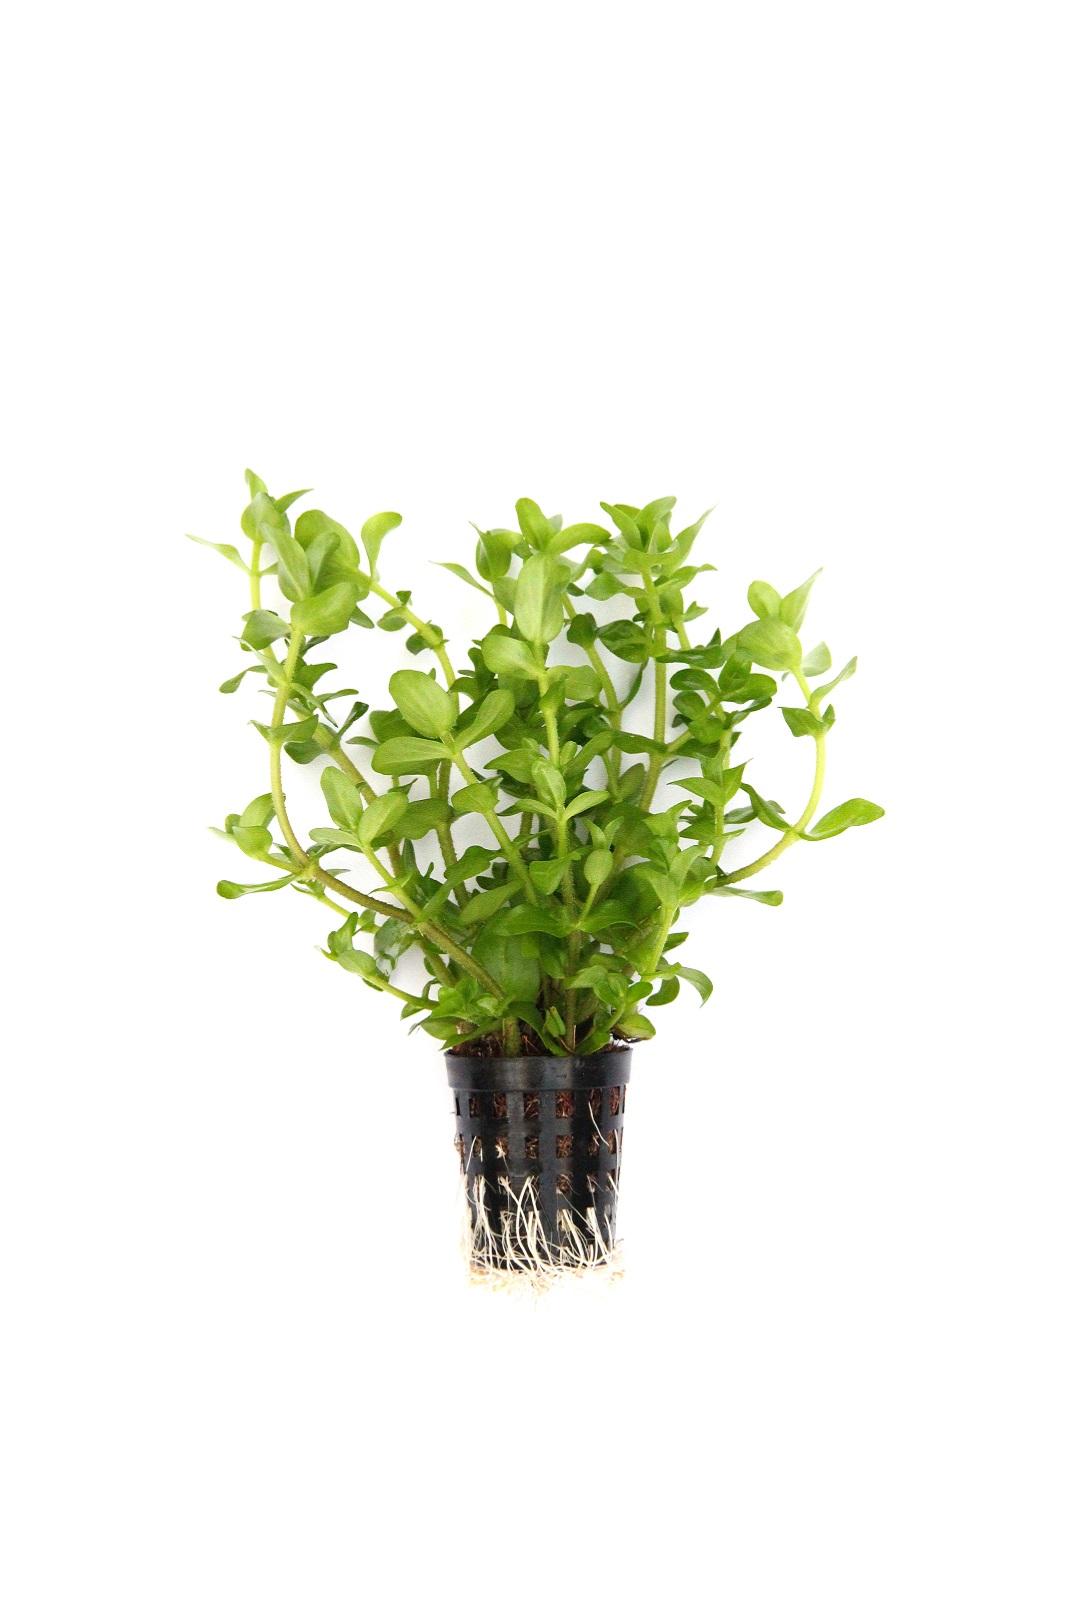 Bacopa caroliniana  großes Fettblatt Aquarium Pflanze